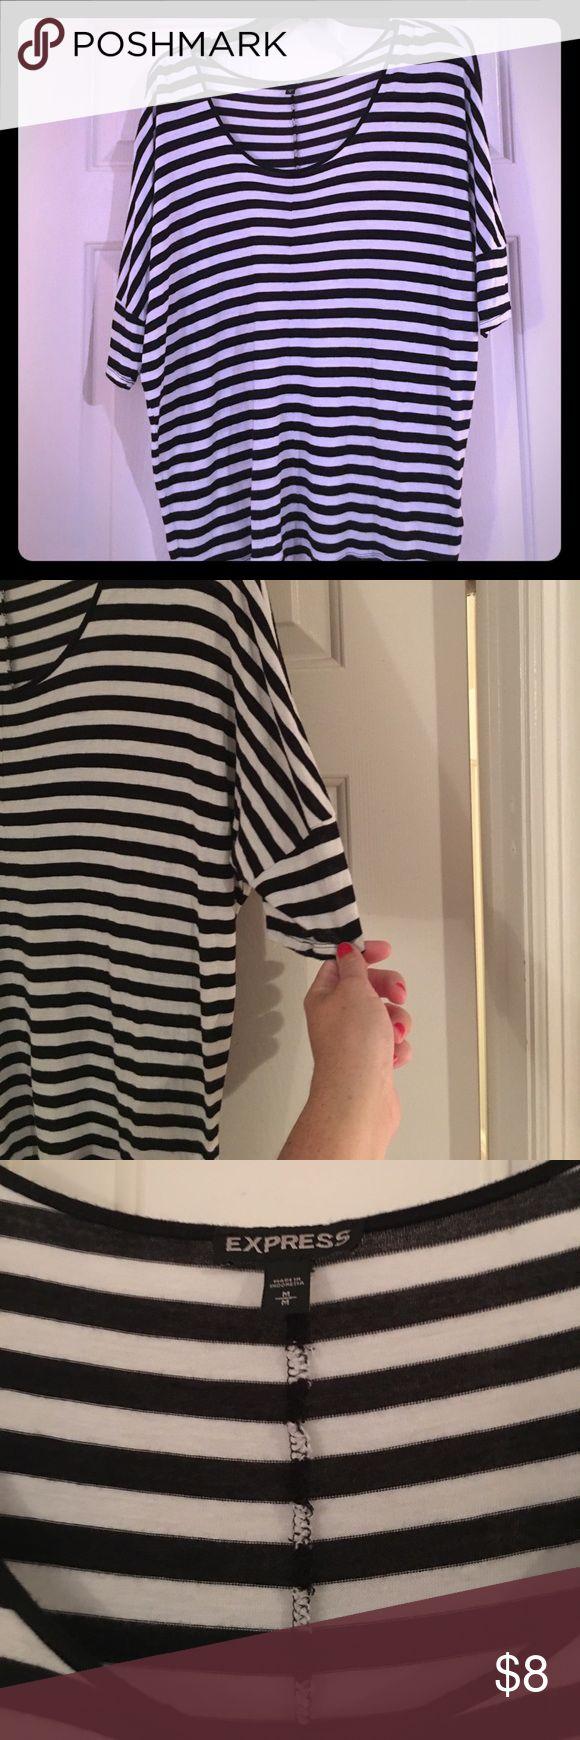 Express Batwing T Shirt Medium Good condition Express Tops Tees - Short Sleeve